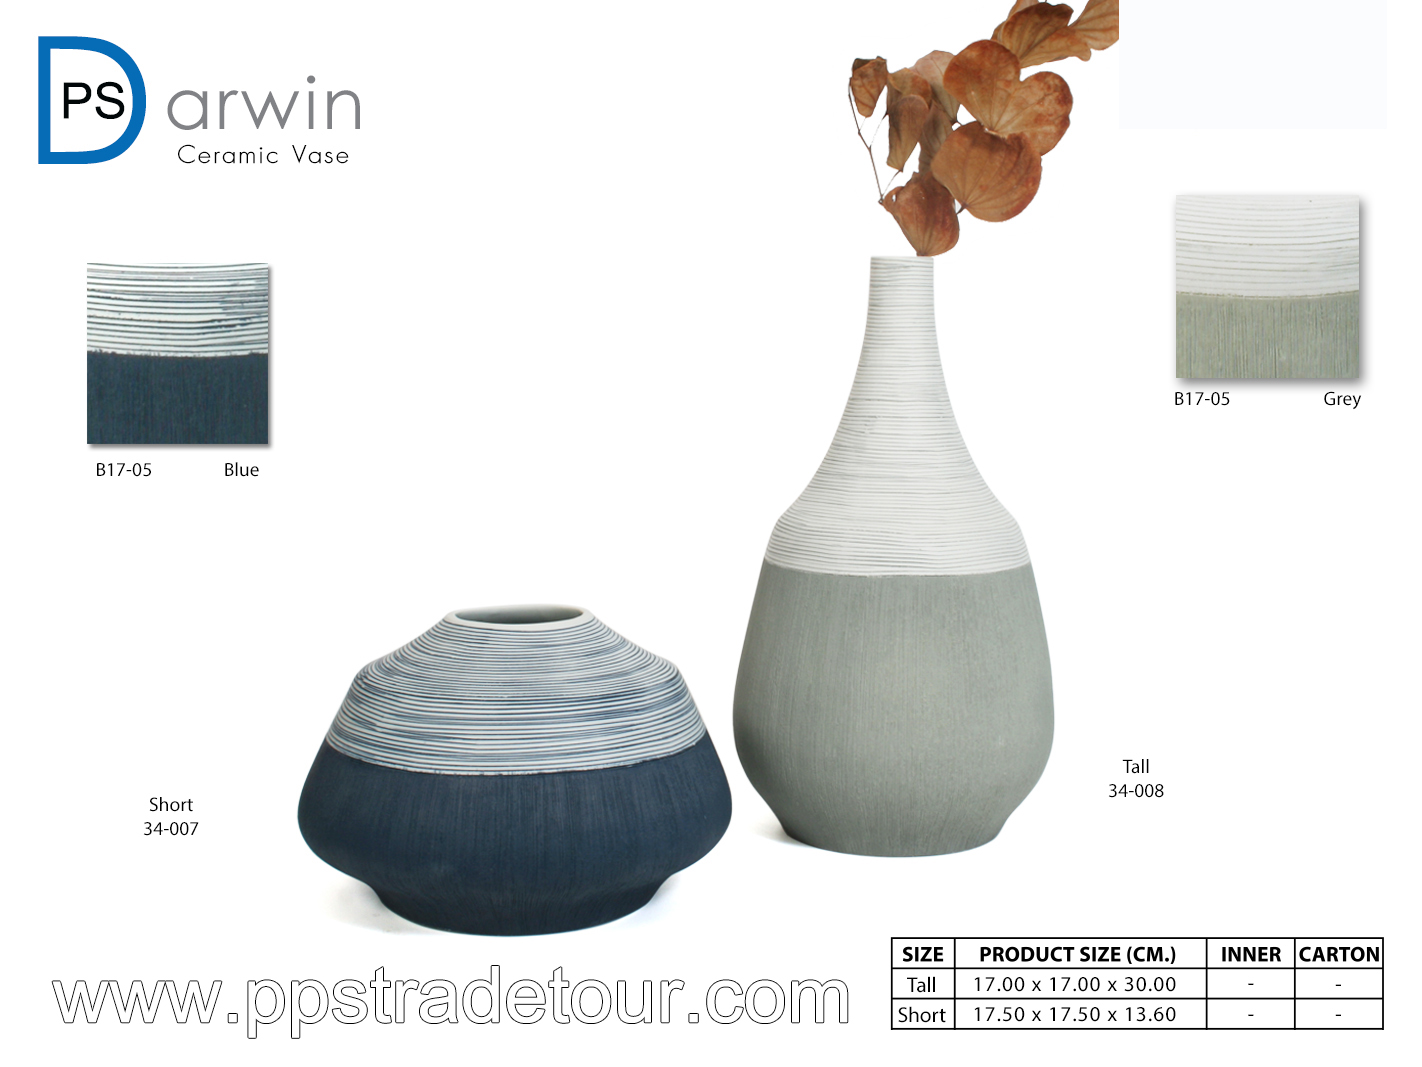 PSCV-Darwin-Tall-short-B17-05